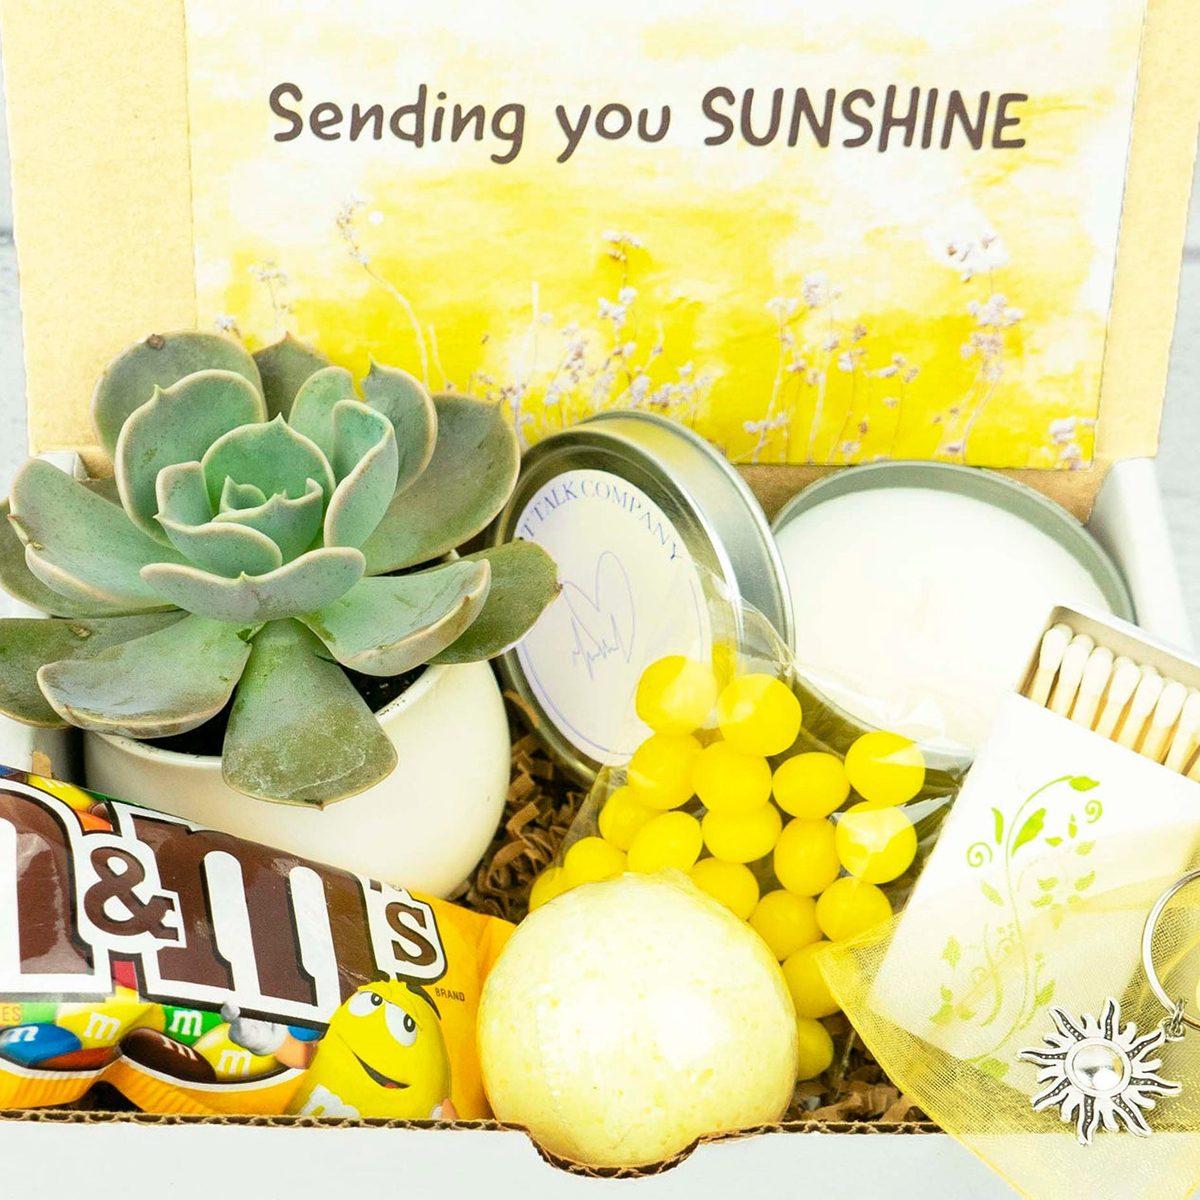 Sunshine Box care package ideas